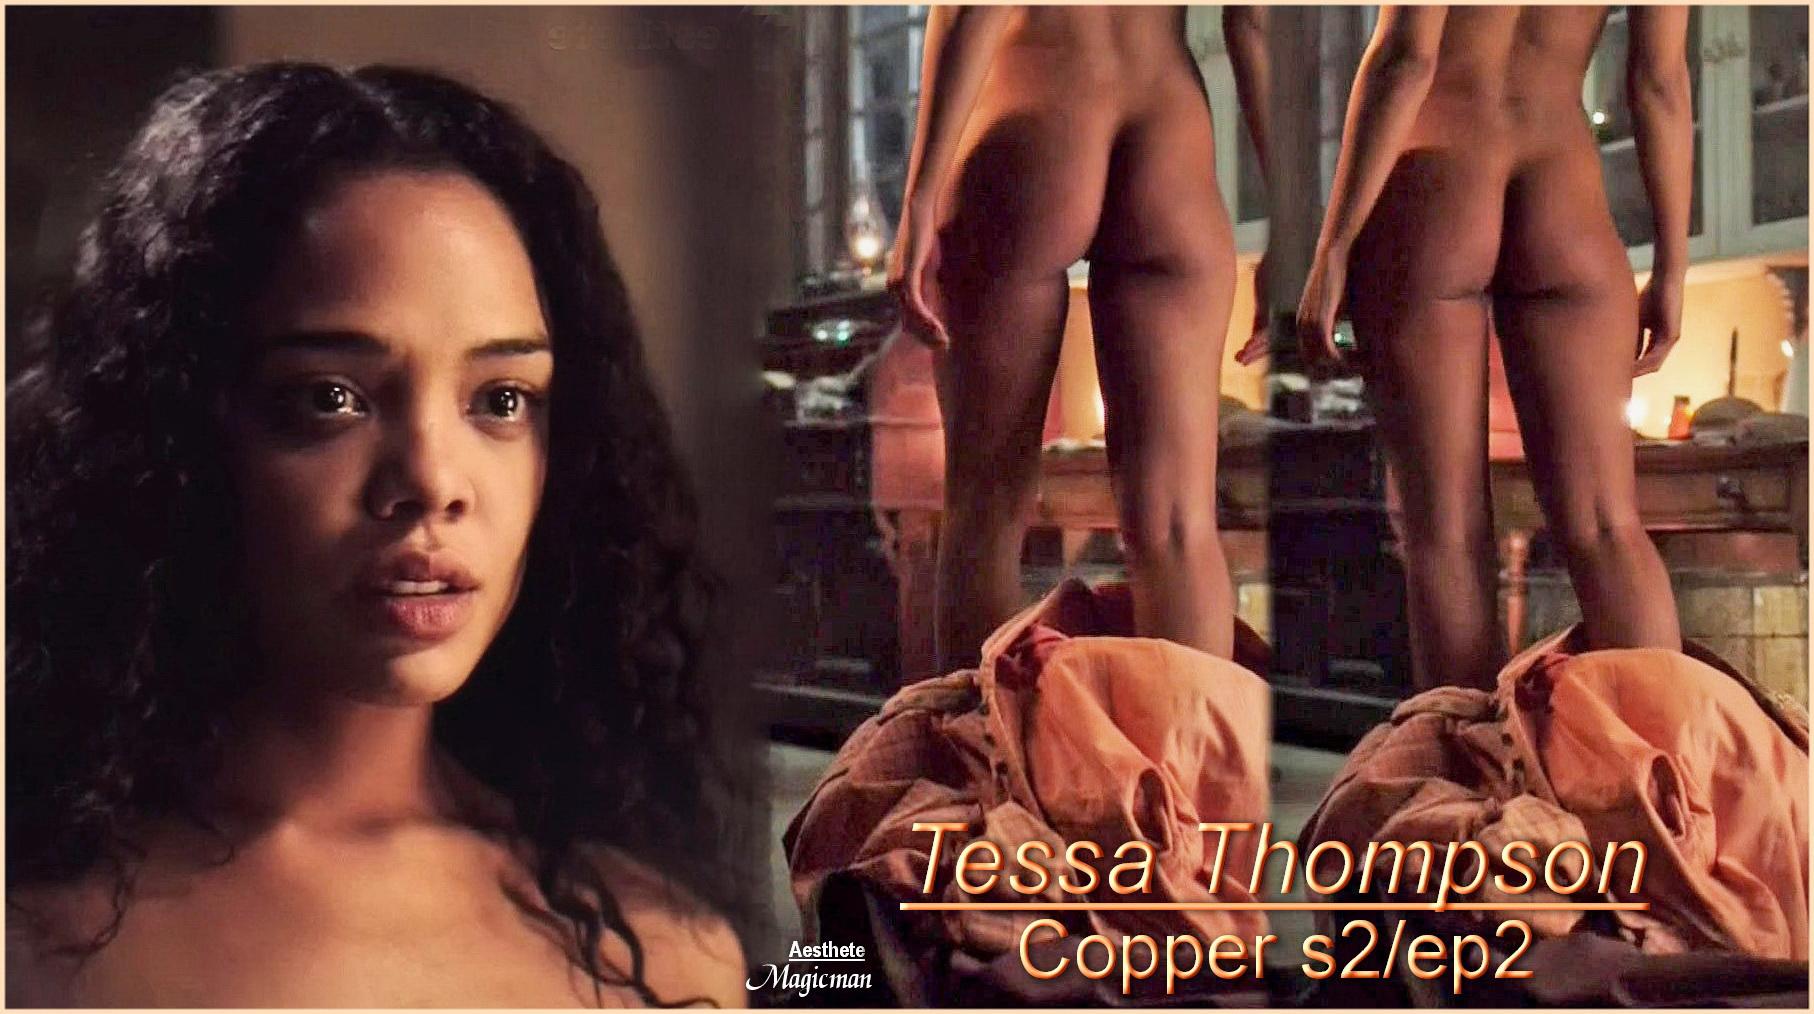 Thompson naked tessa 60 Sexy